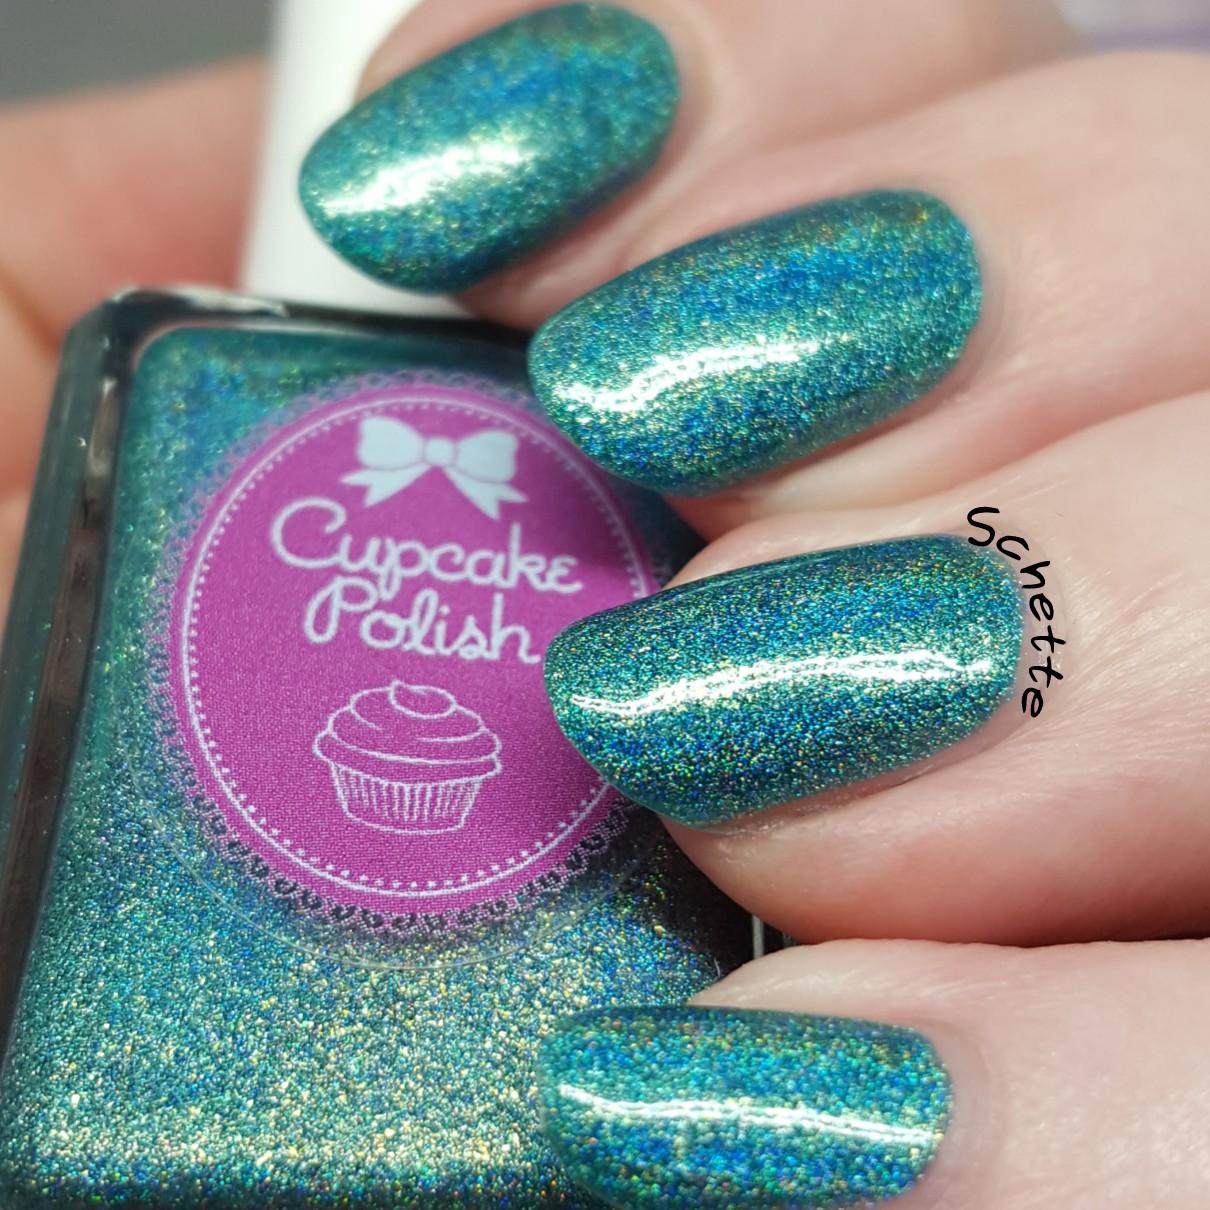 Cupcake Polish - Cleopatra